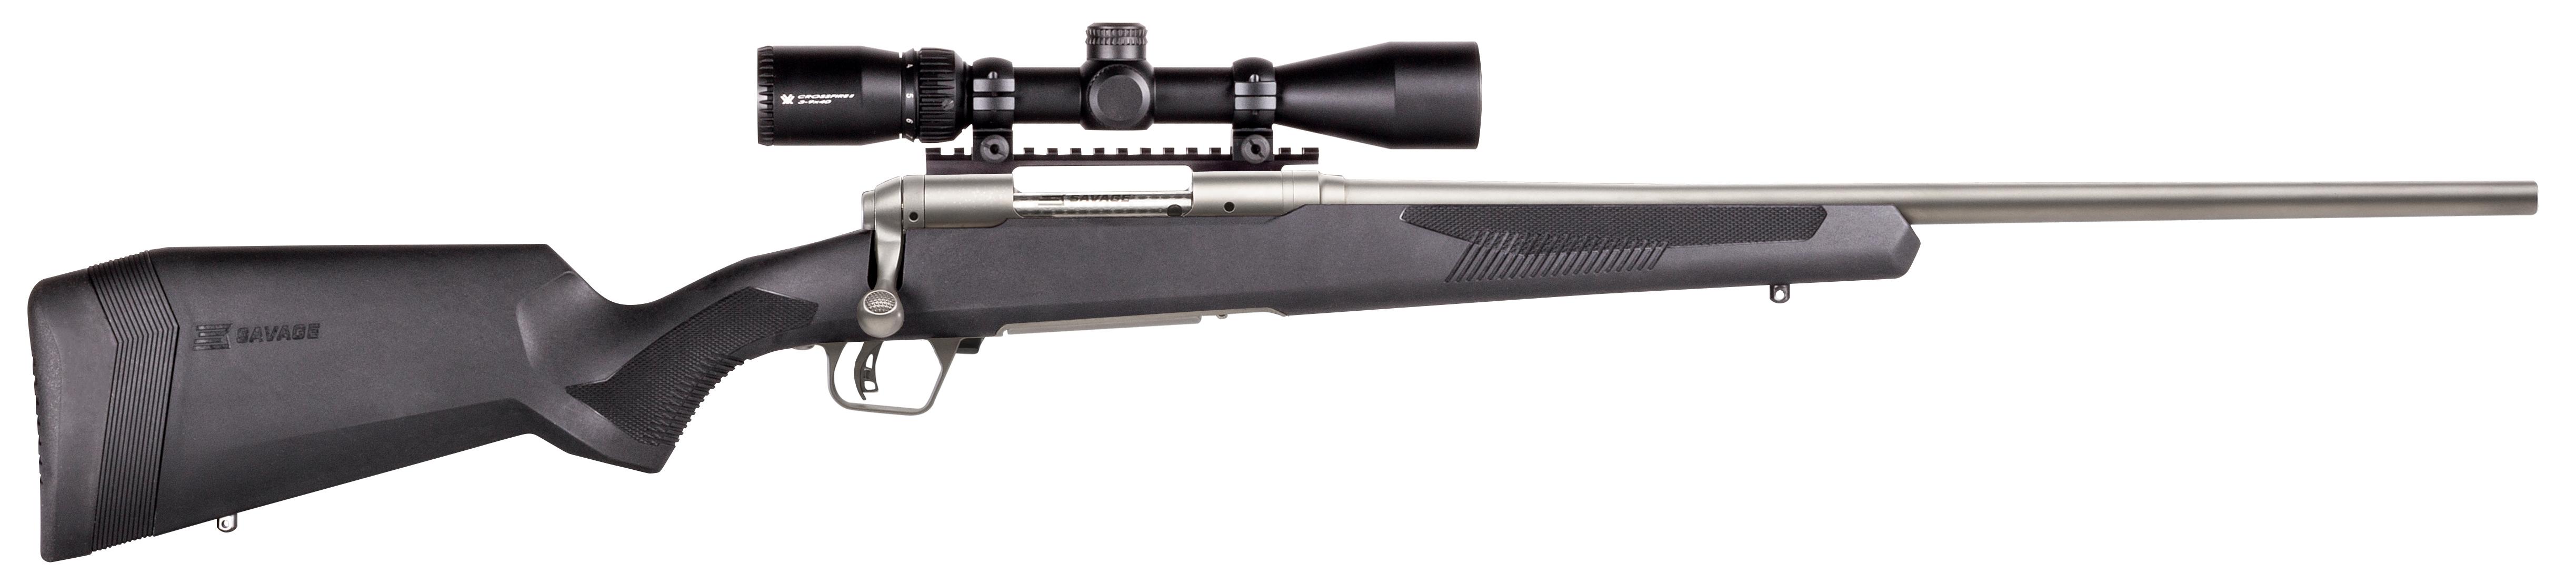 Savage Arms 110 Apex Storm XP 270 Win